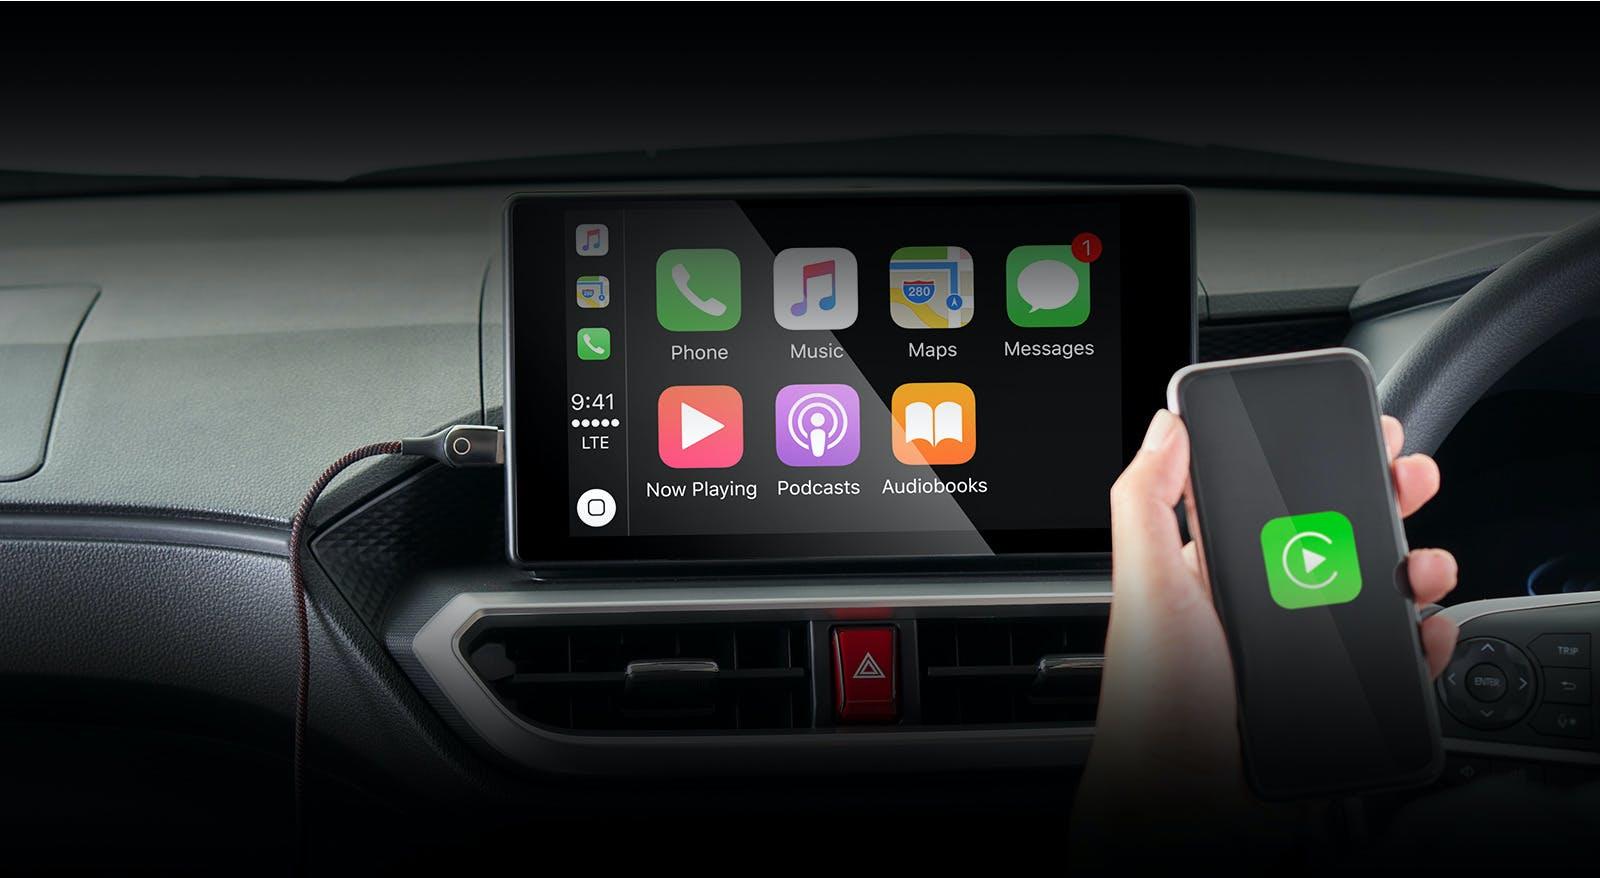 "Harga dan Spesifikasi Daihatsu Rocky Pekanbaru - 9"" DISPLAY AUDIO SUPPORT SMARTPHONE CONNECTION"